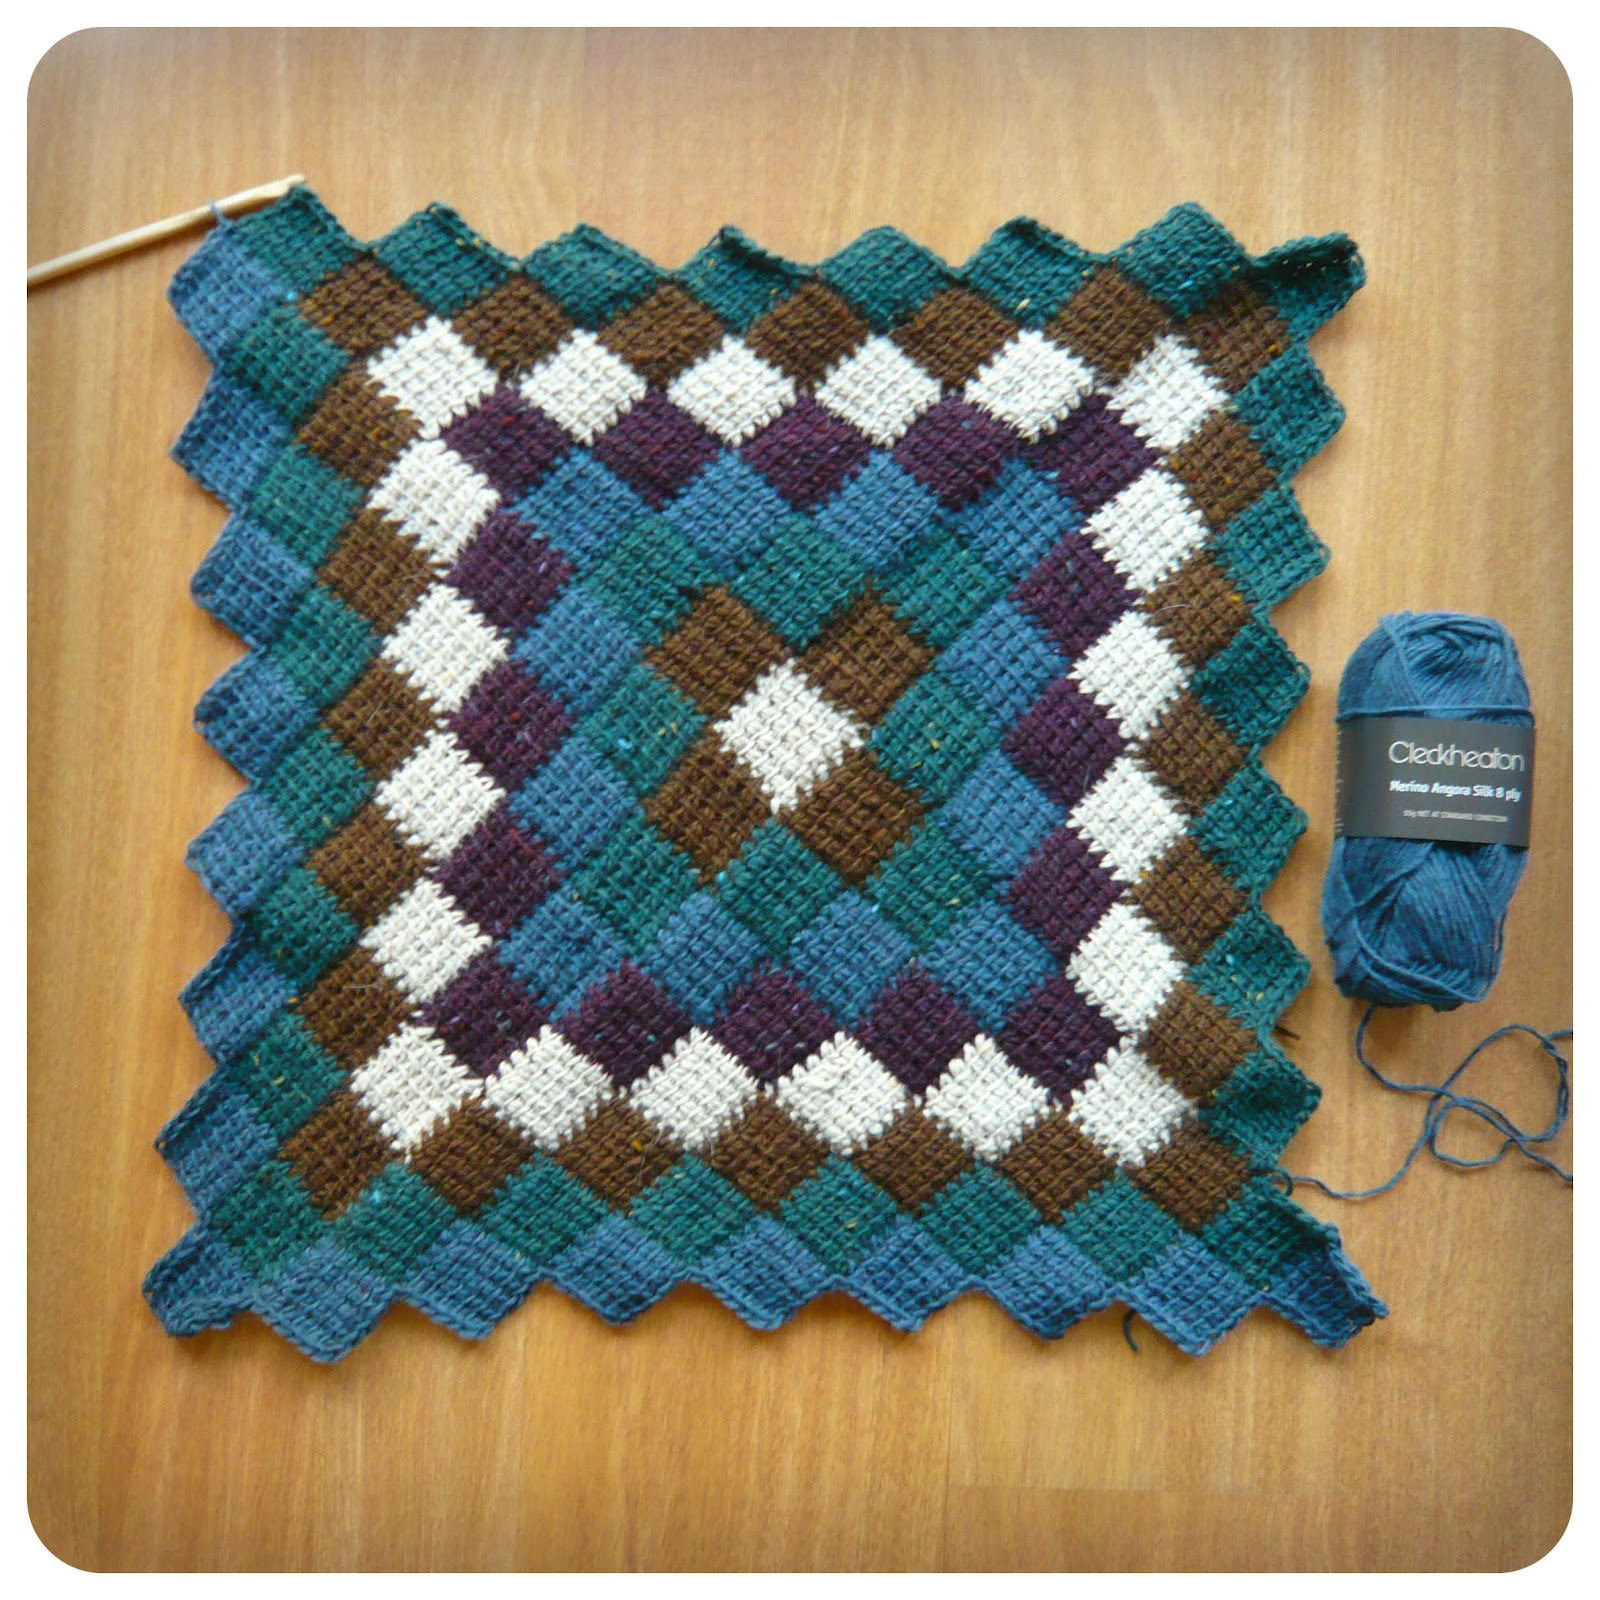 Shara lambeth designs entrelac tunisian crochet blanket entrelac tunisian crochet blanket bankloansurffo Gallery